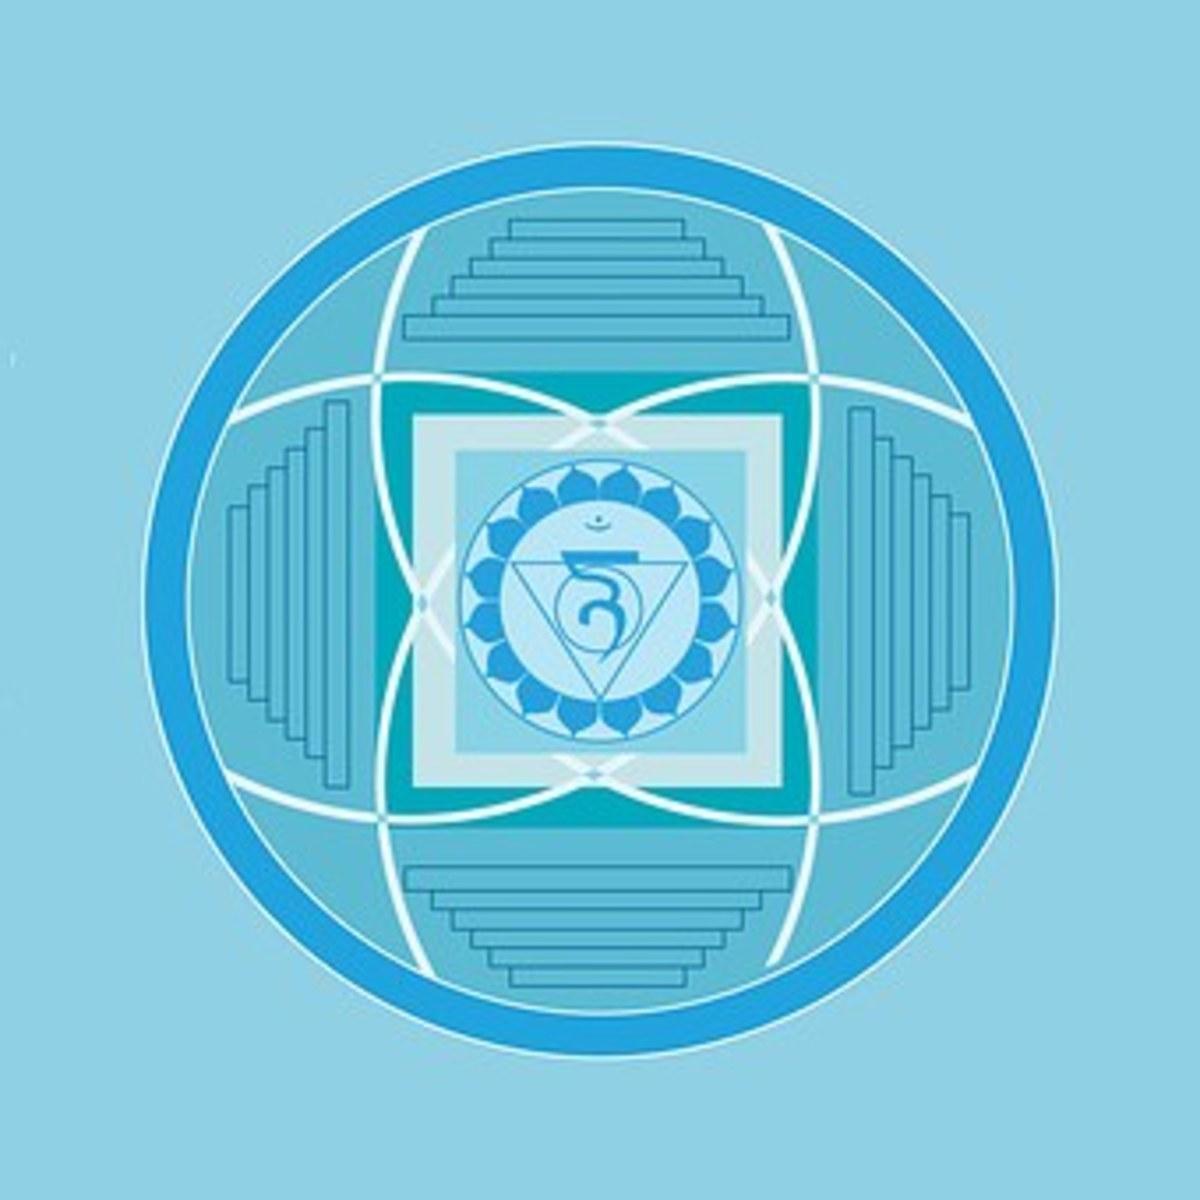 Chakra Energy Centers: The Throat Chakra